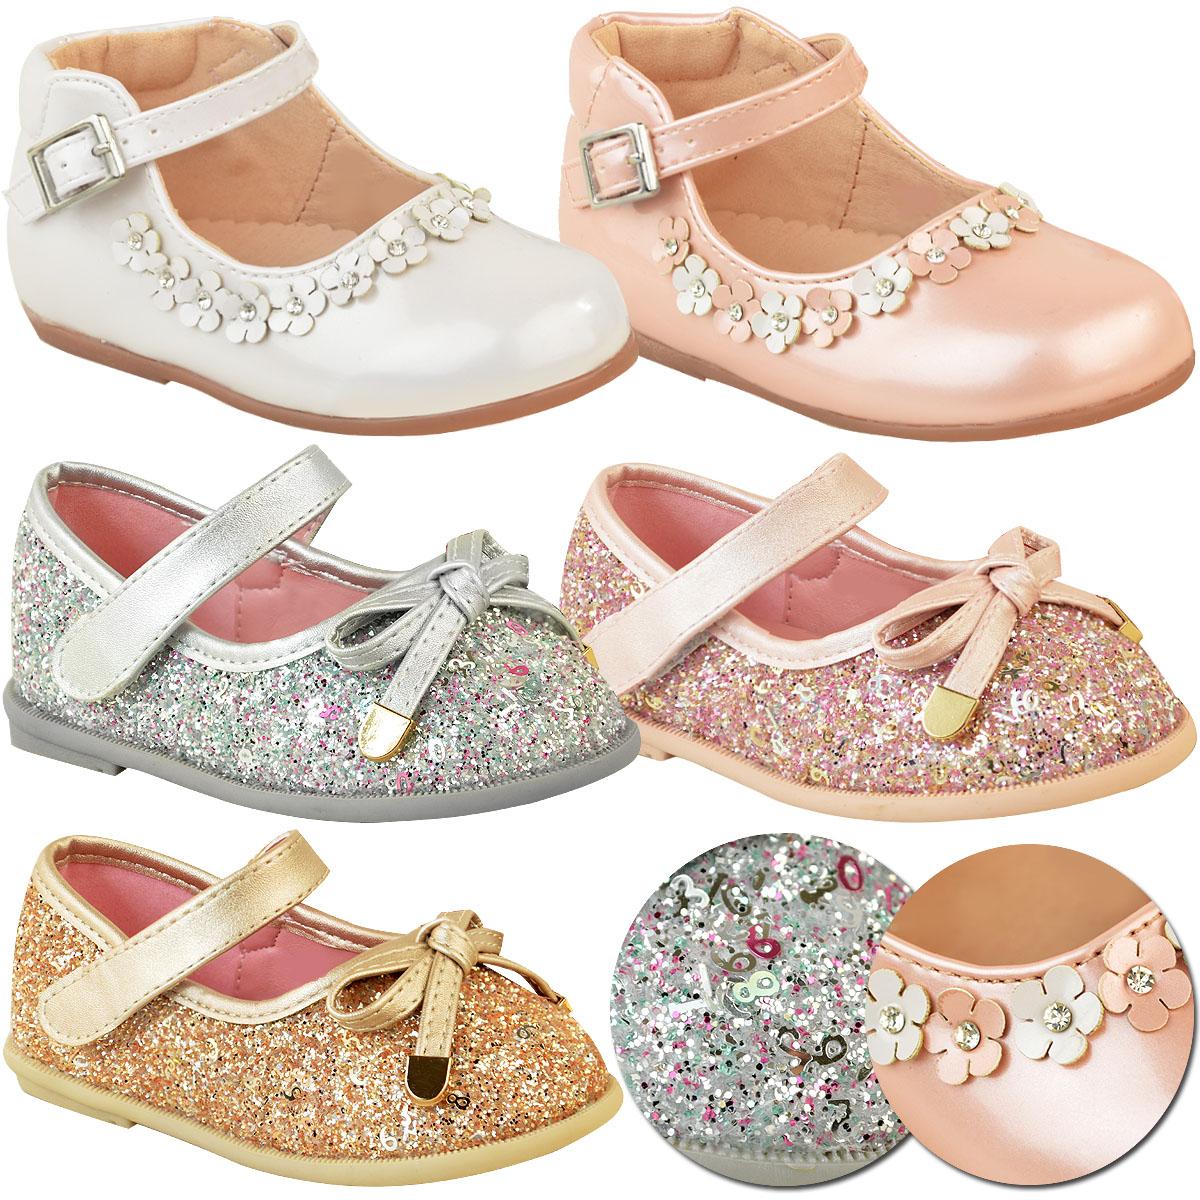 Girls Infant Children Pink Satin Flower Girl Ballerina Shoes Wedding Bridesmaid